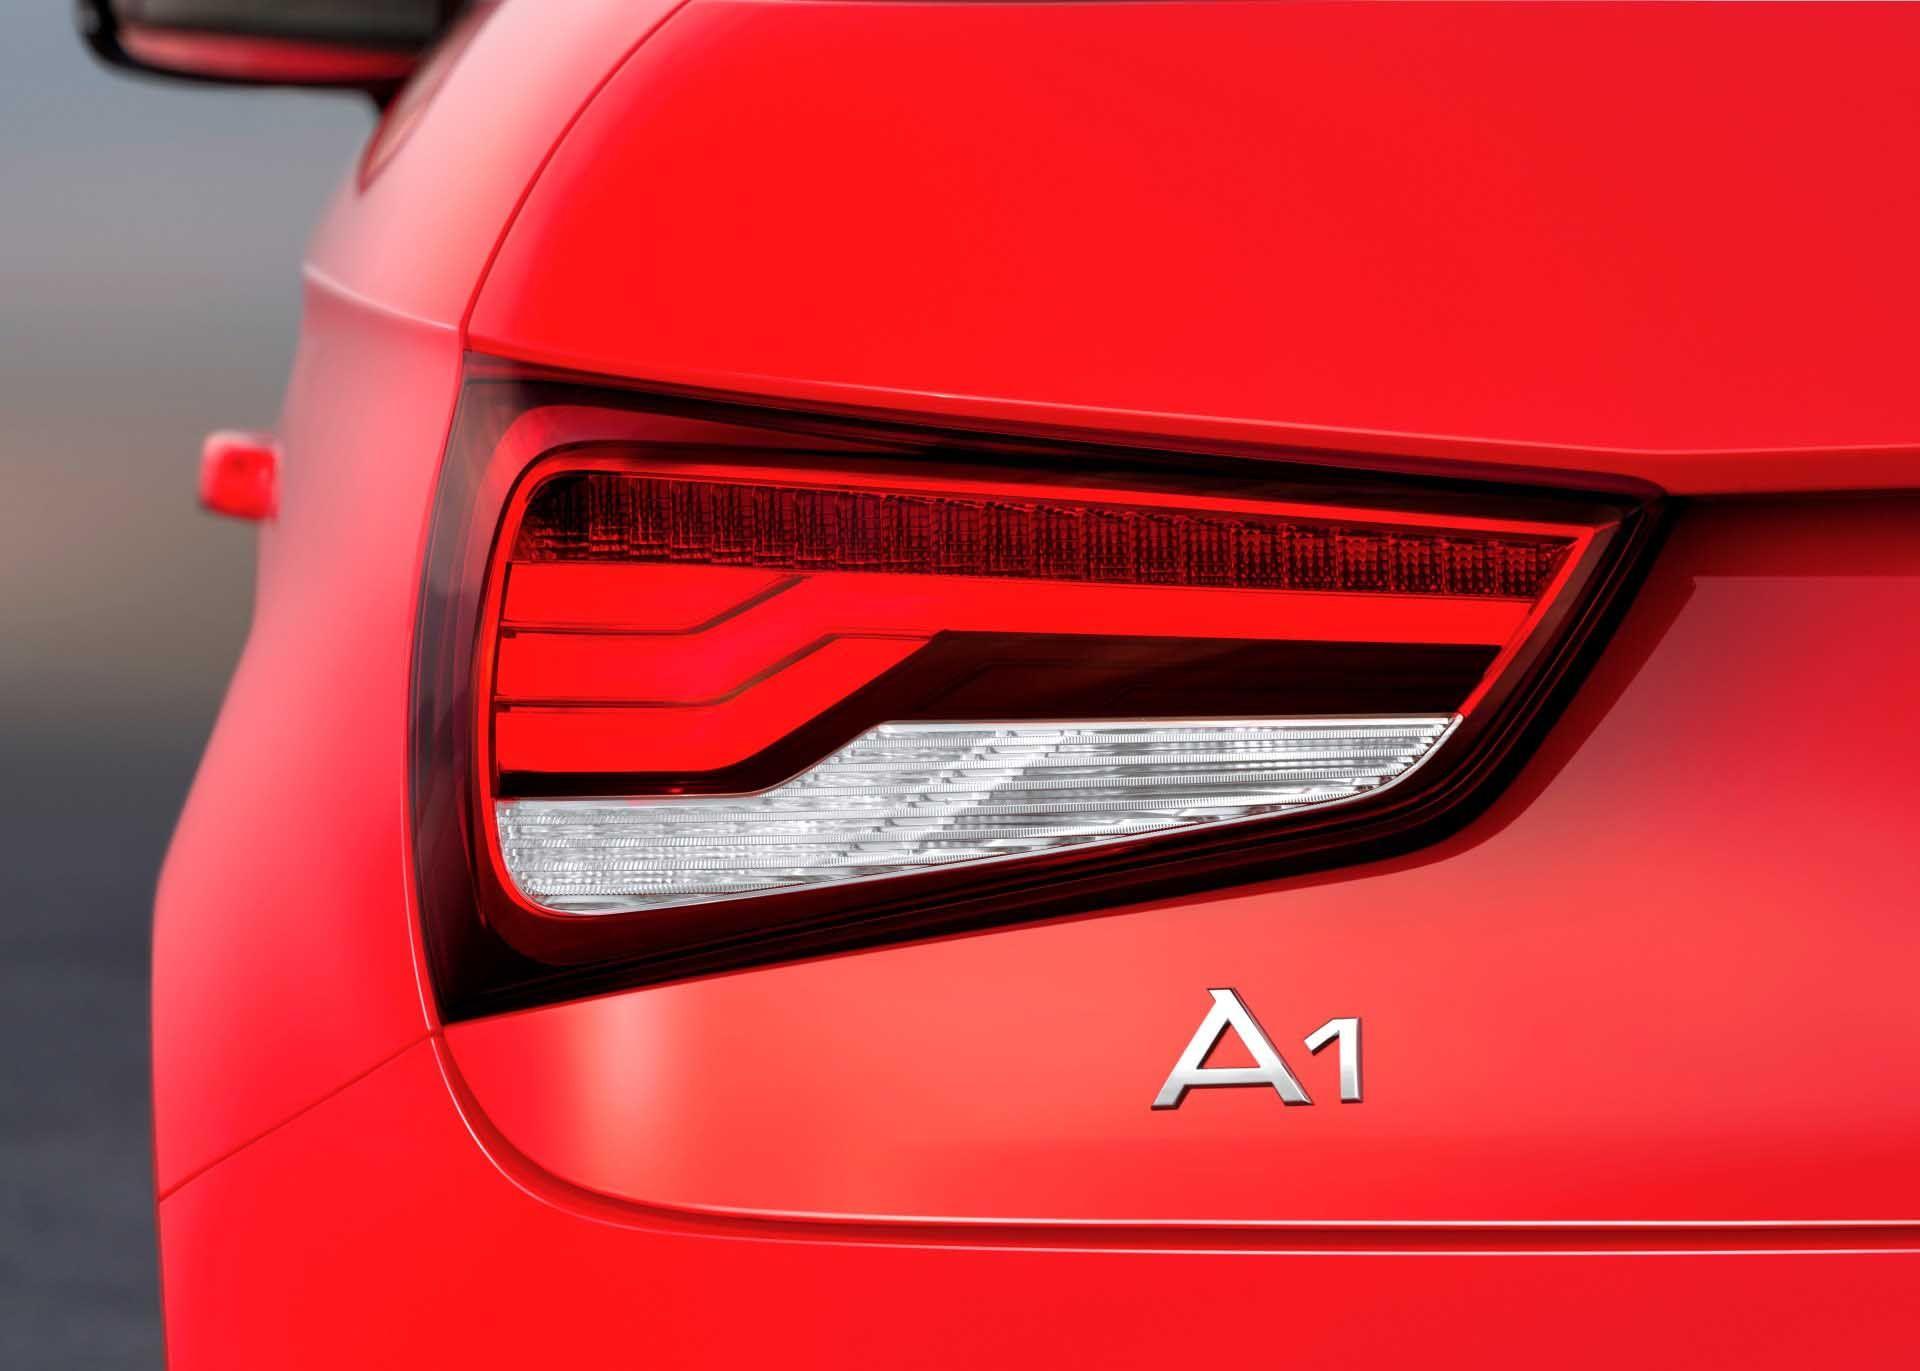 Download Grand Audi A1 Left Rear Light Box Full Hd Wallpaper Full Size 400